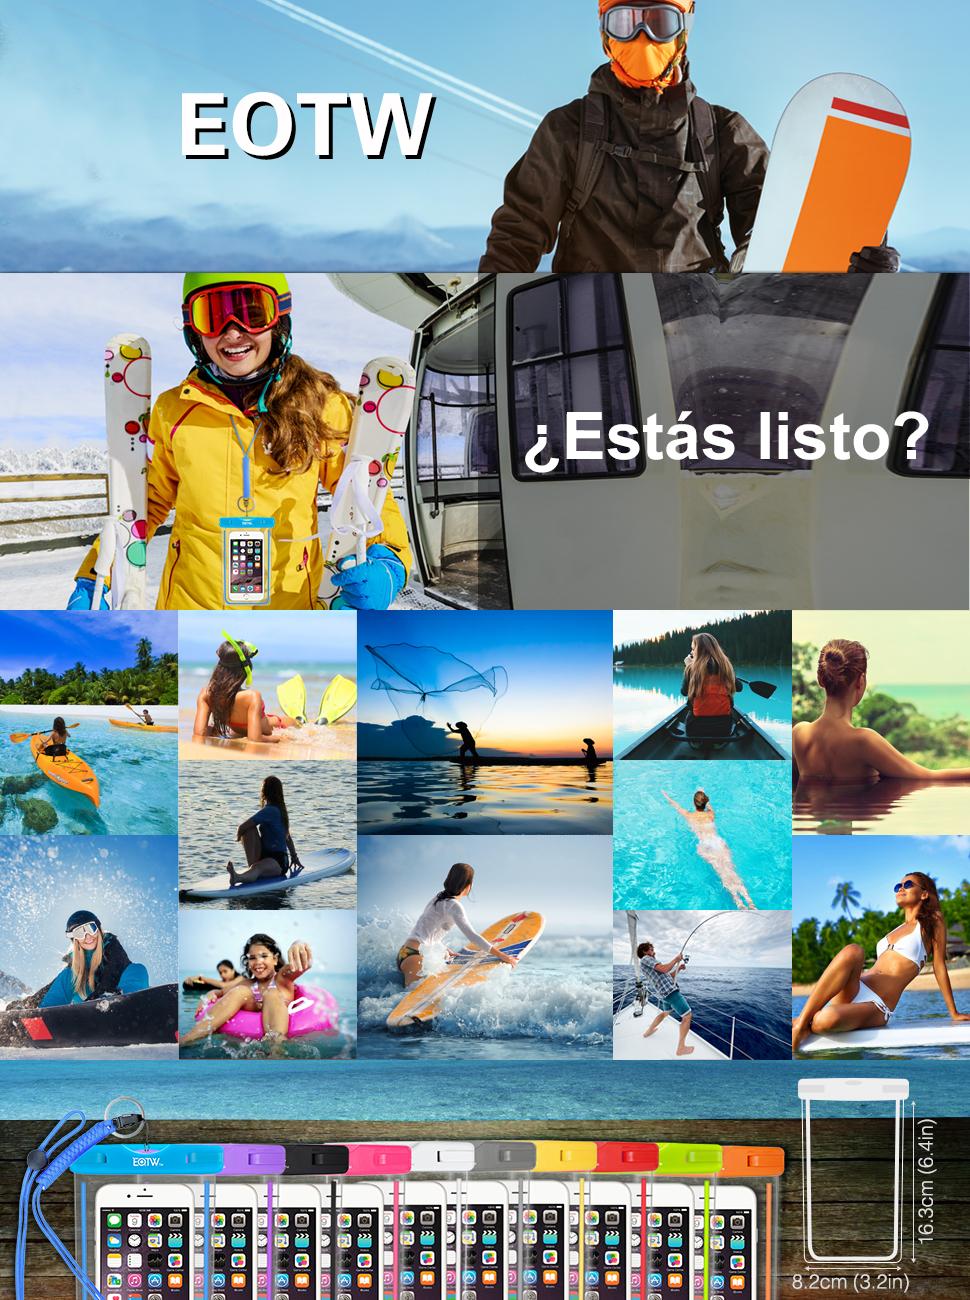 EOTW Funda Impermeable Móvil ☆ Prepárate para la próxima aventura. Estuche  impermeable universal EOTW diseñado exclusivamente para la mayoría de los  ... a11618db95c